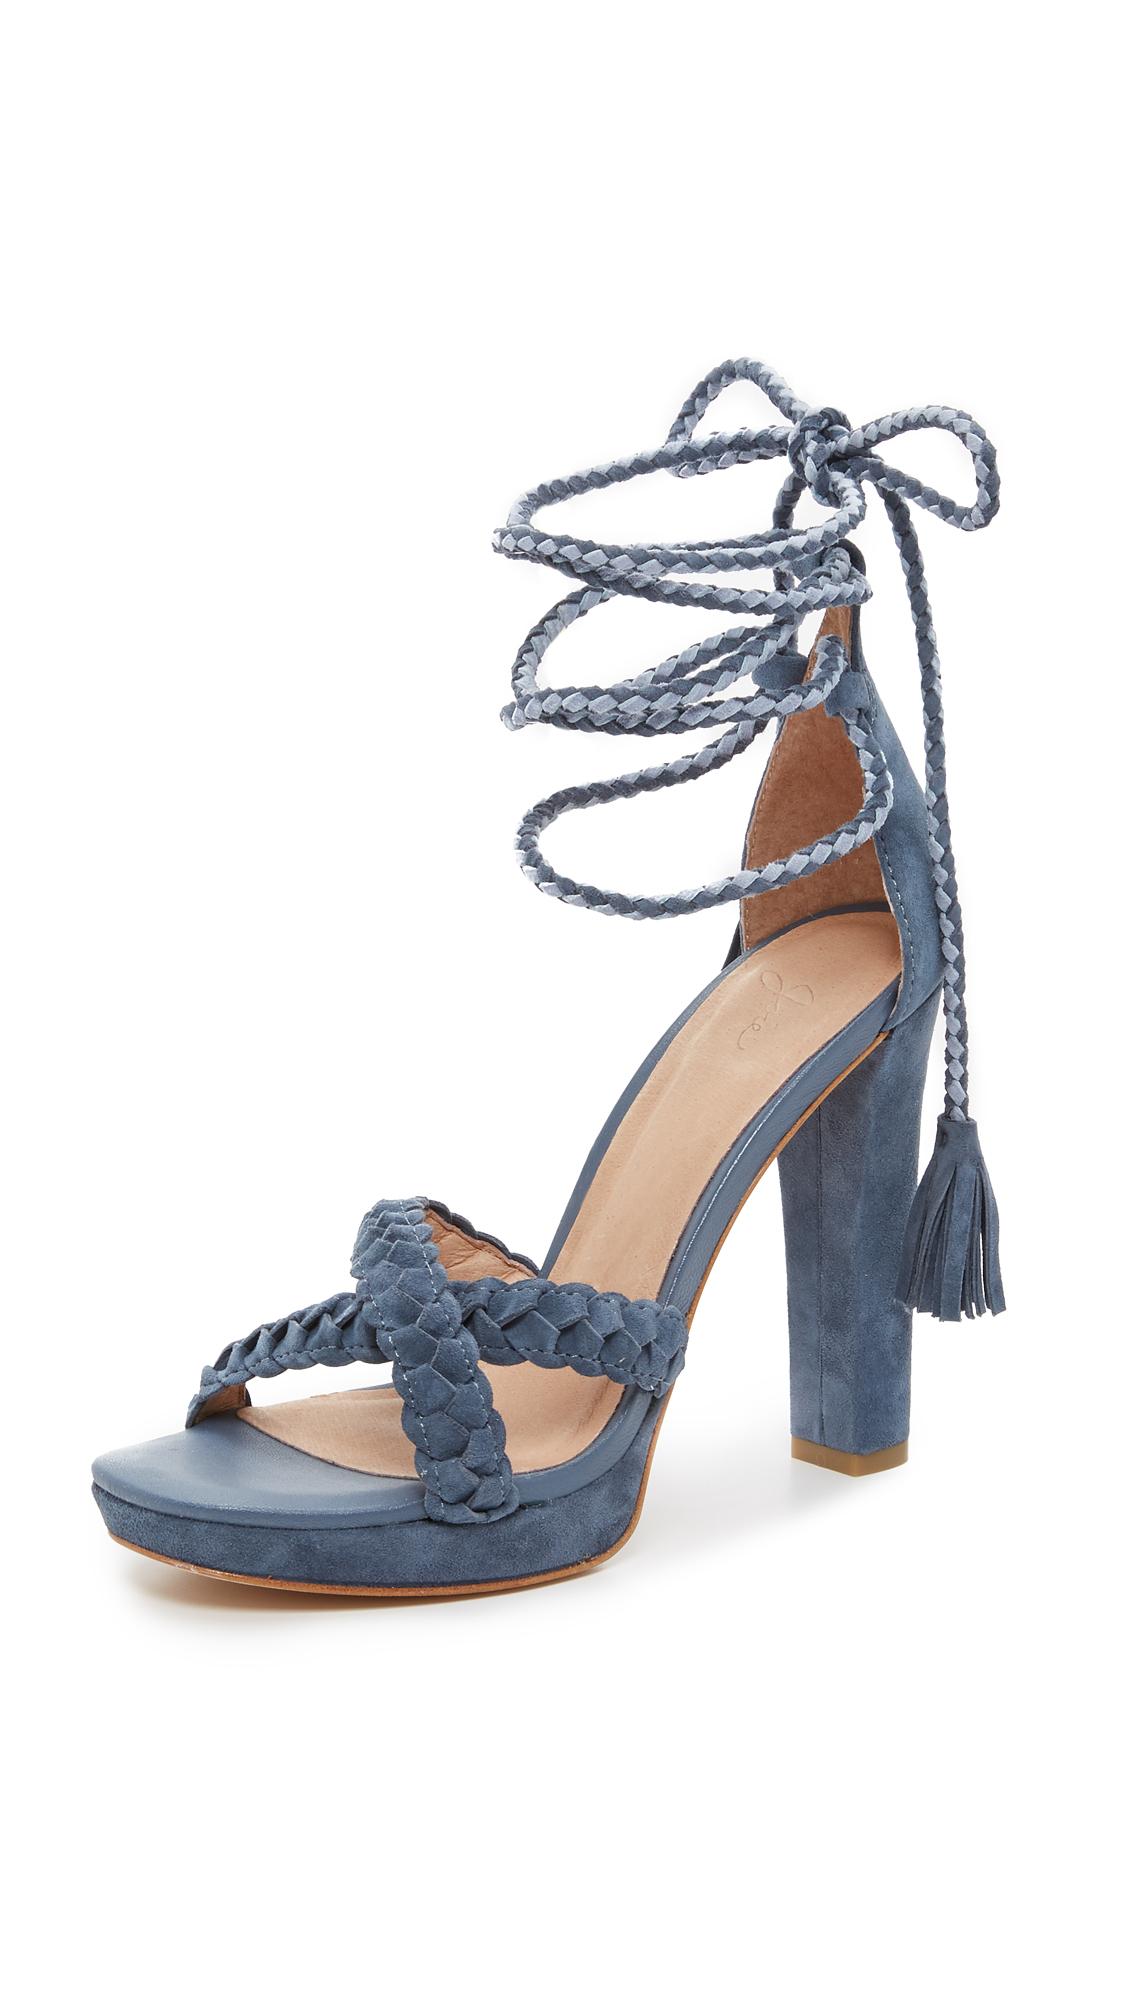 807cde27bd70 Joie Flo Ankle Wrap Sandals